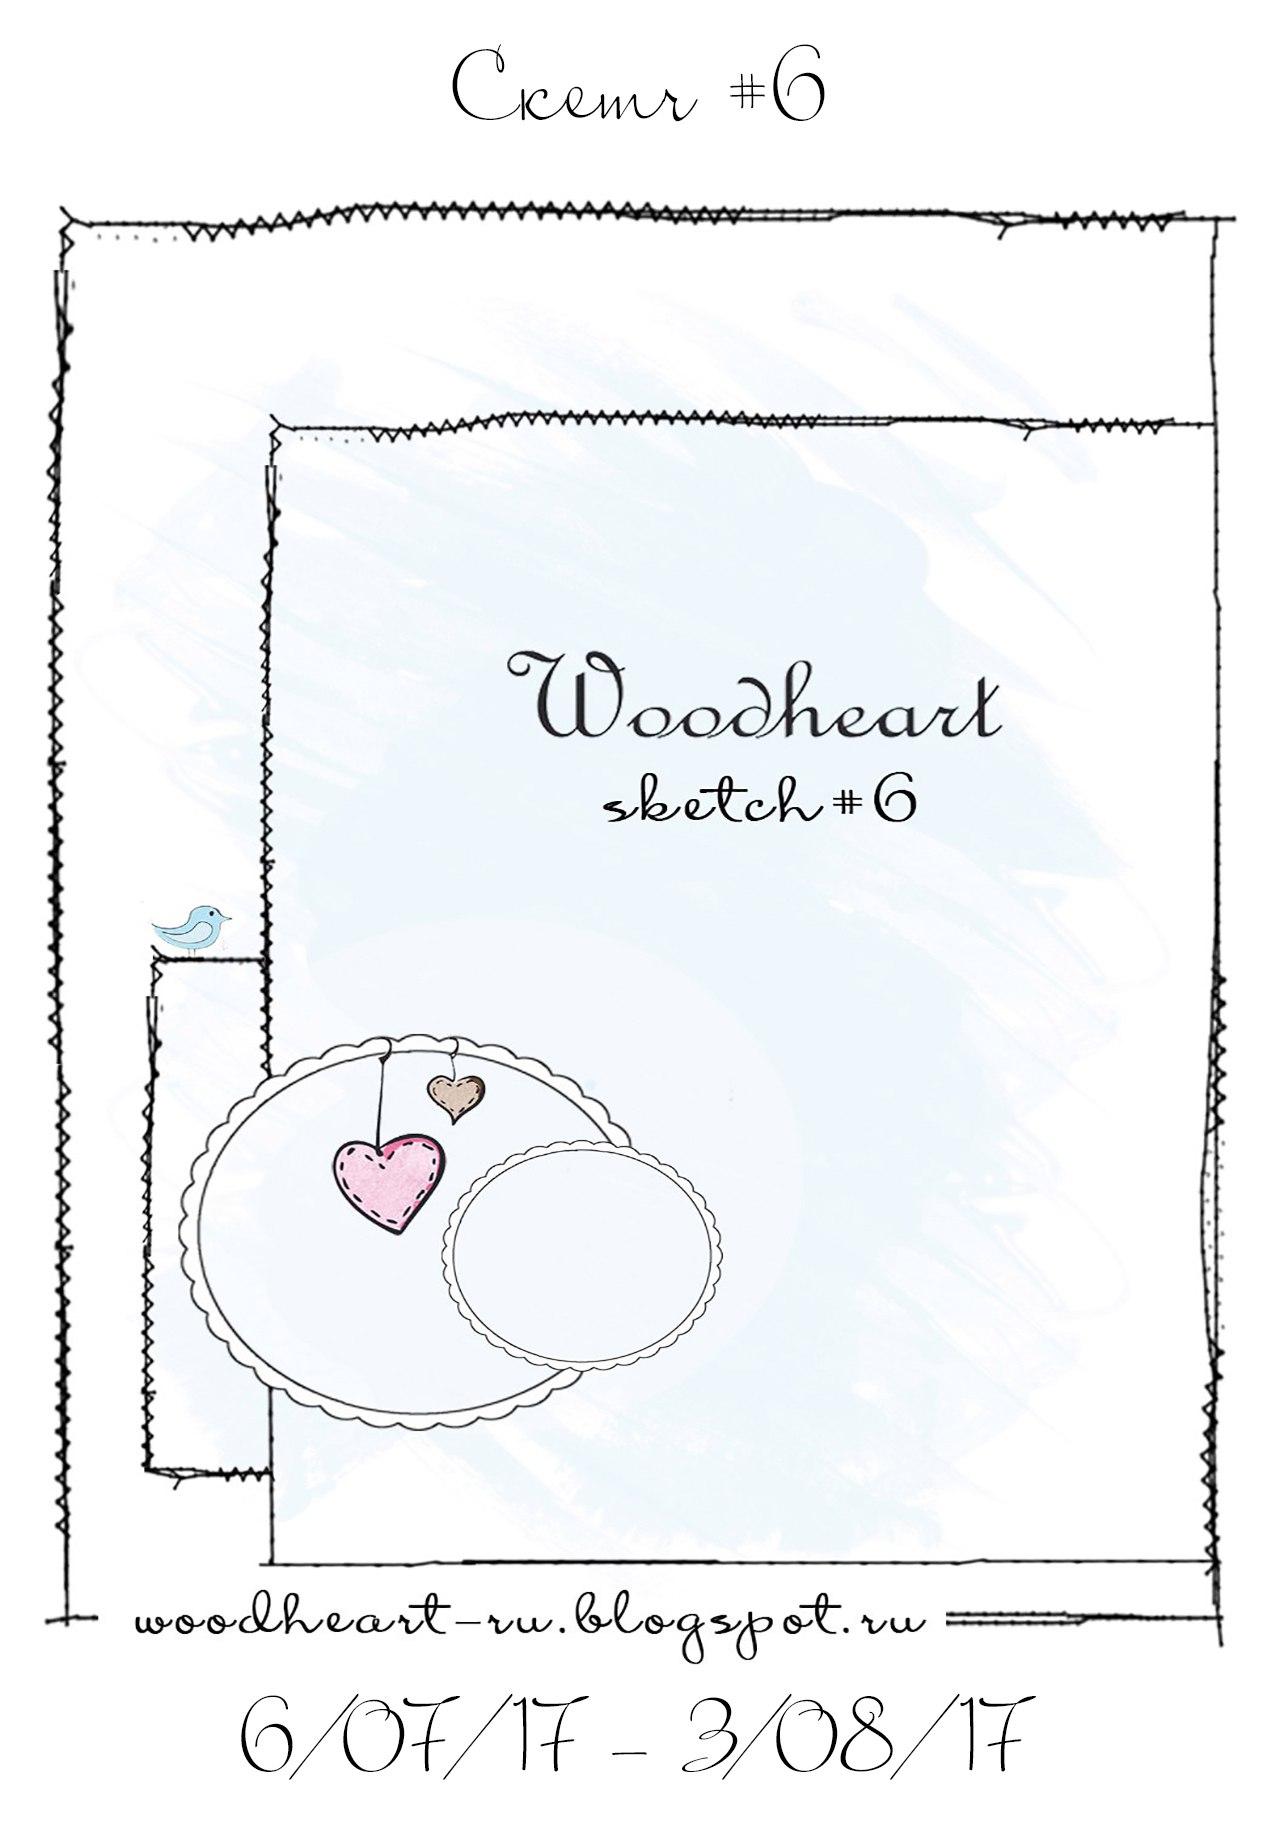 http://woodheart-ru.blogspot.ru/2017/07/6.html